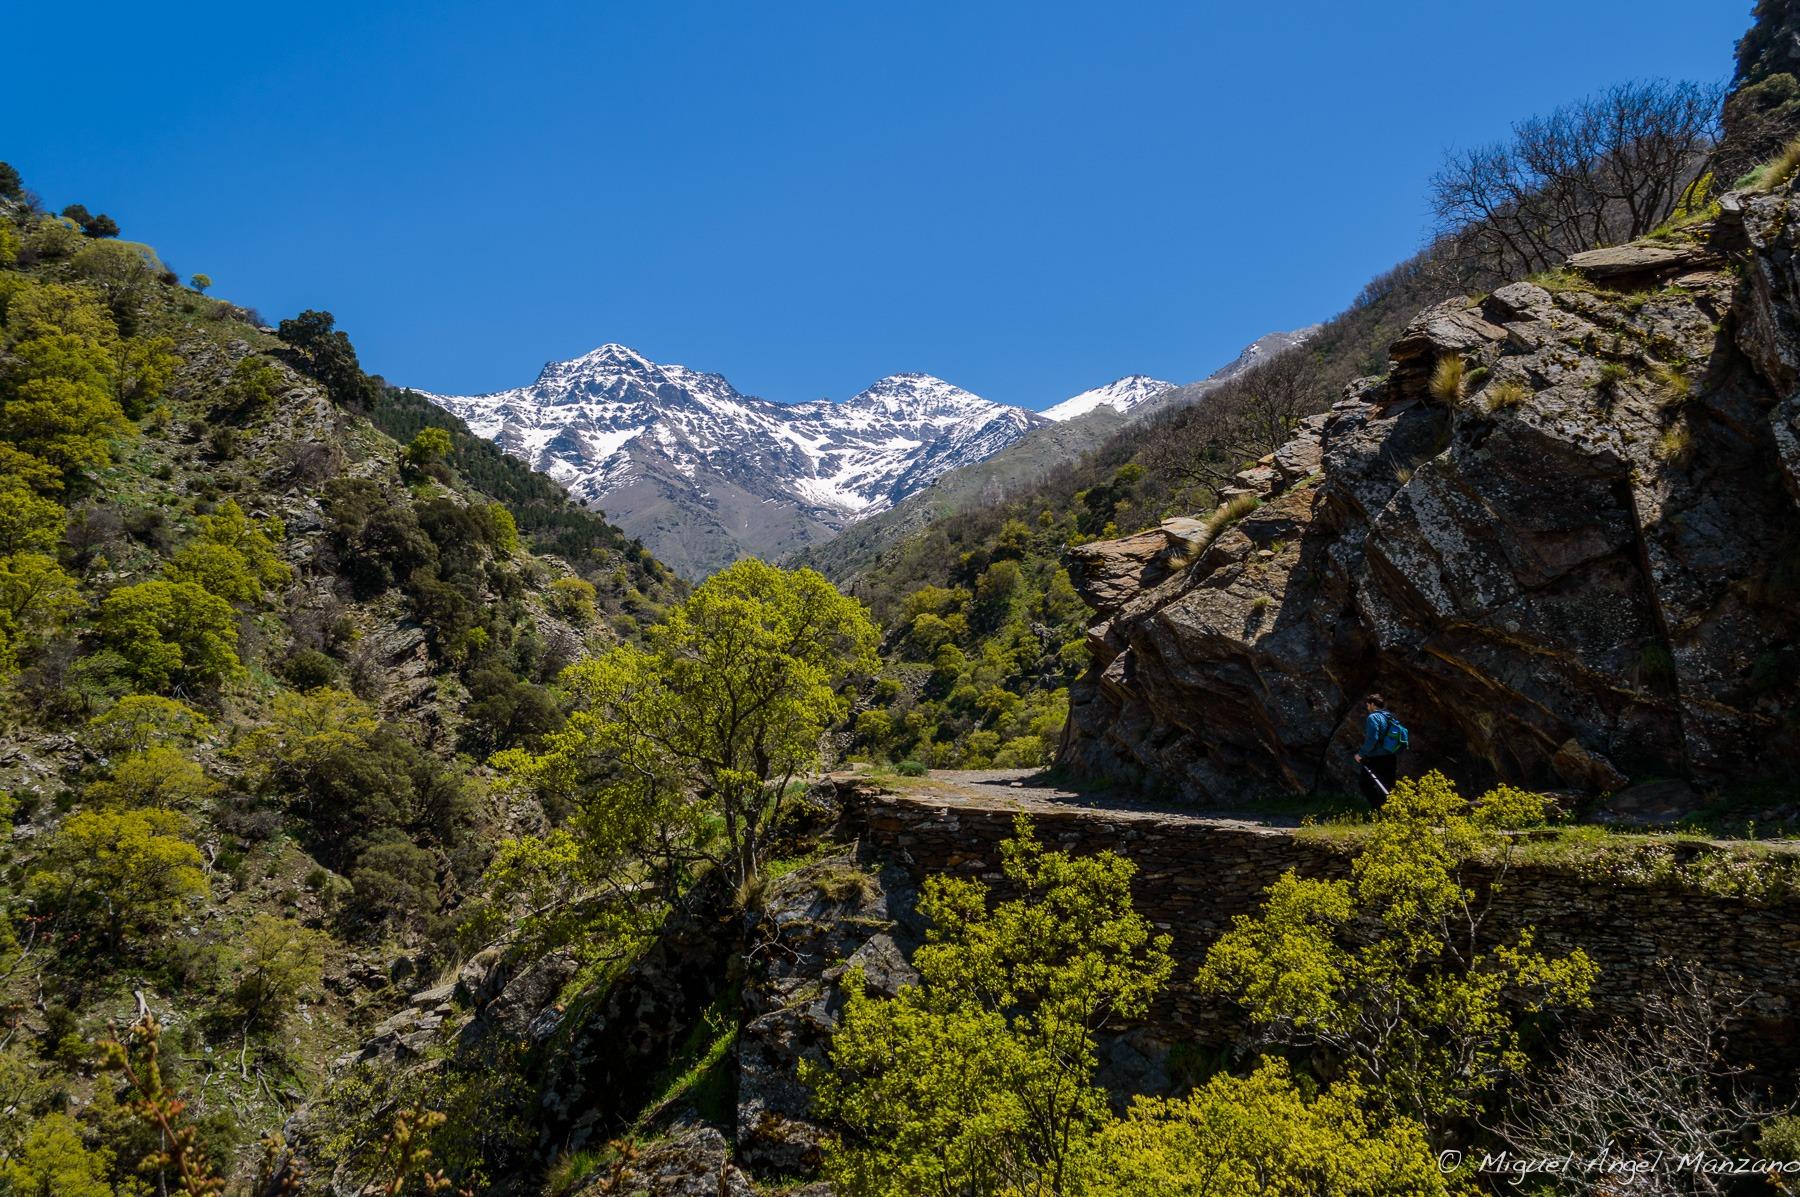 ereda de la Estrella, Sierra Nevada al fondo (I)